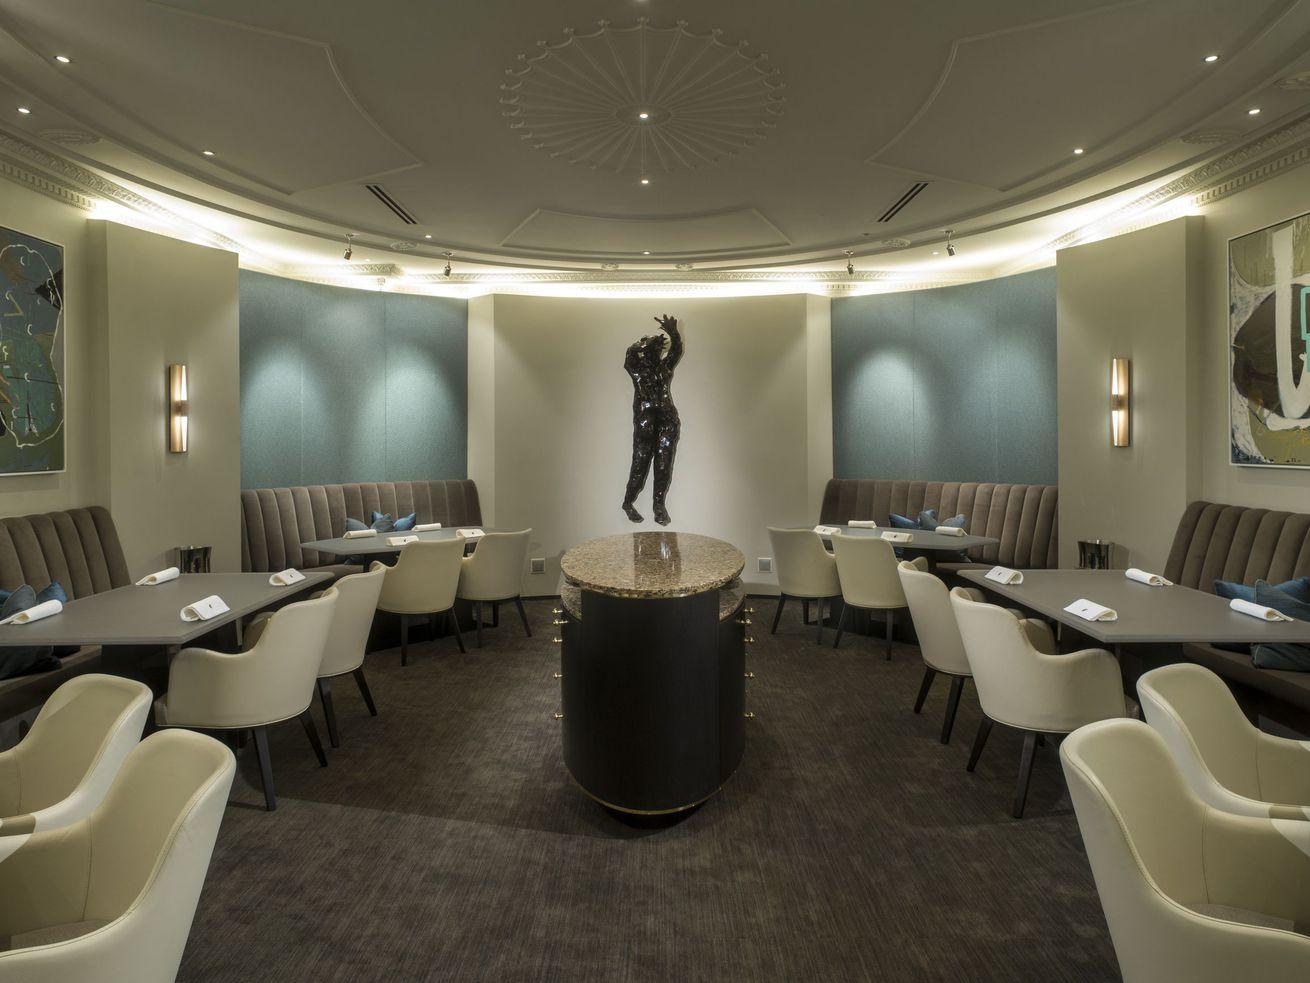 Alinea ranked No. 37 on the 2019 World's 50 Best Restaurant list.